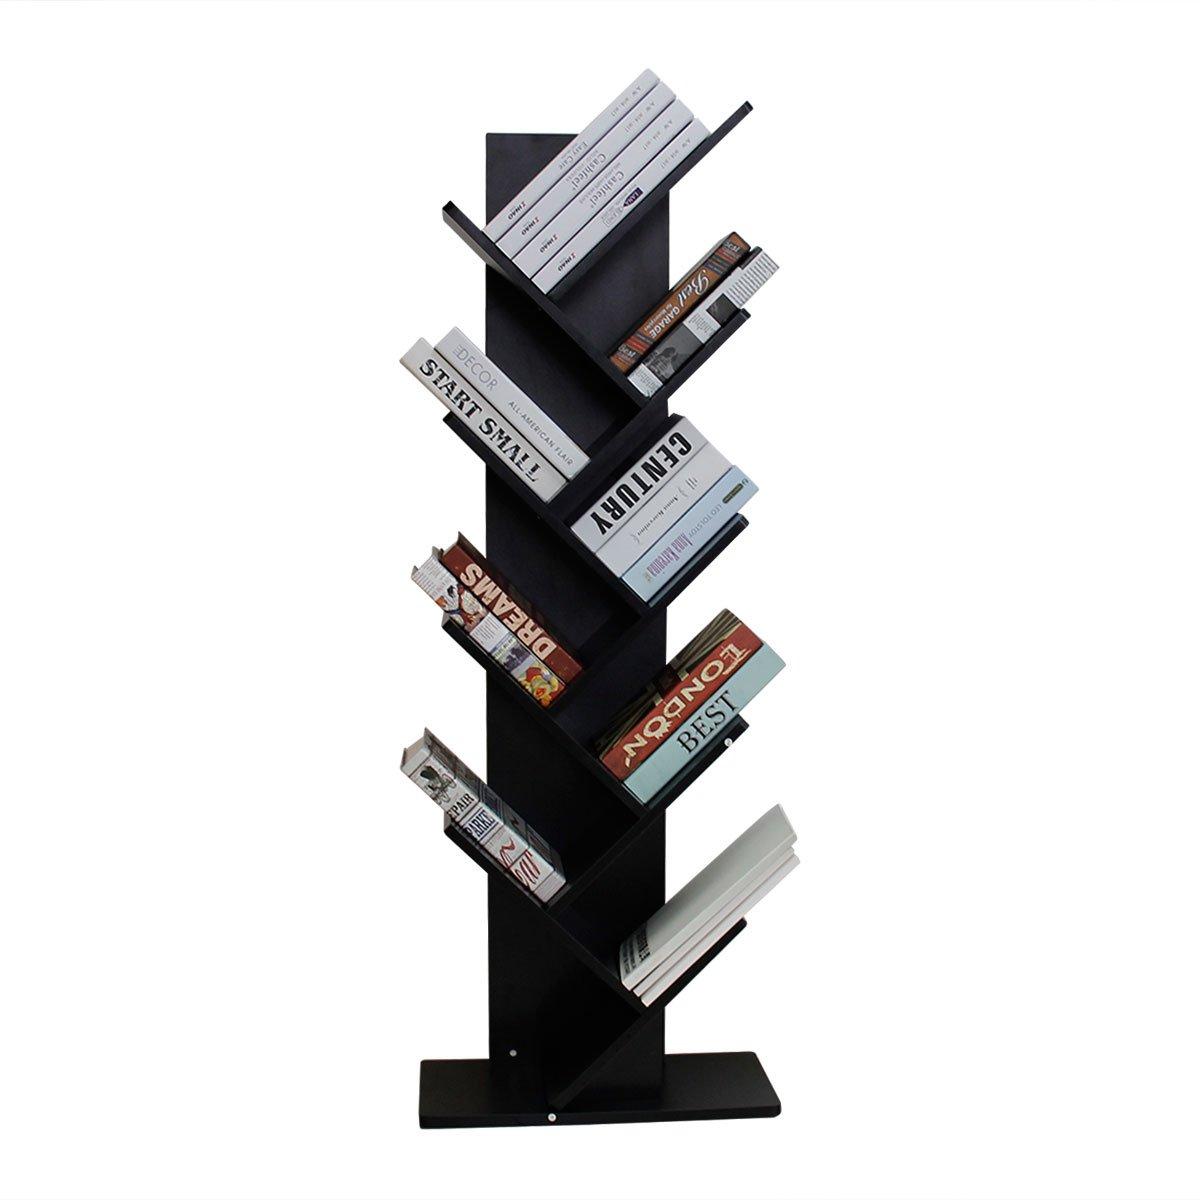 Bizzoelife 9-Shelf Tree Bookshelf Compact Bookrack Bookcase Storing Furniture for Decoration CDs, Books